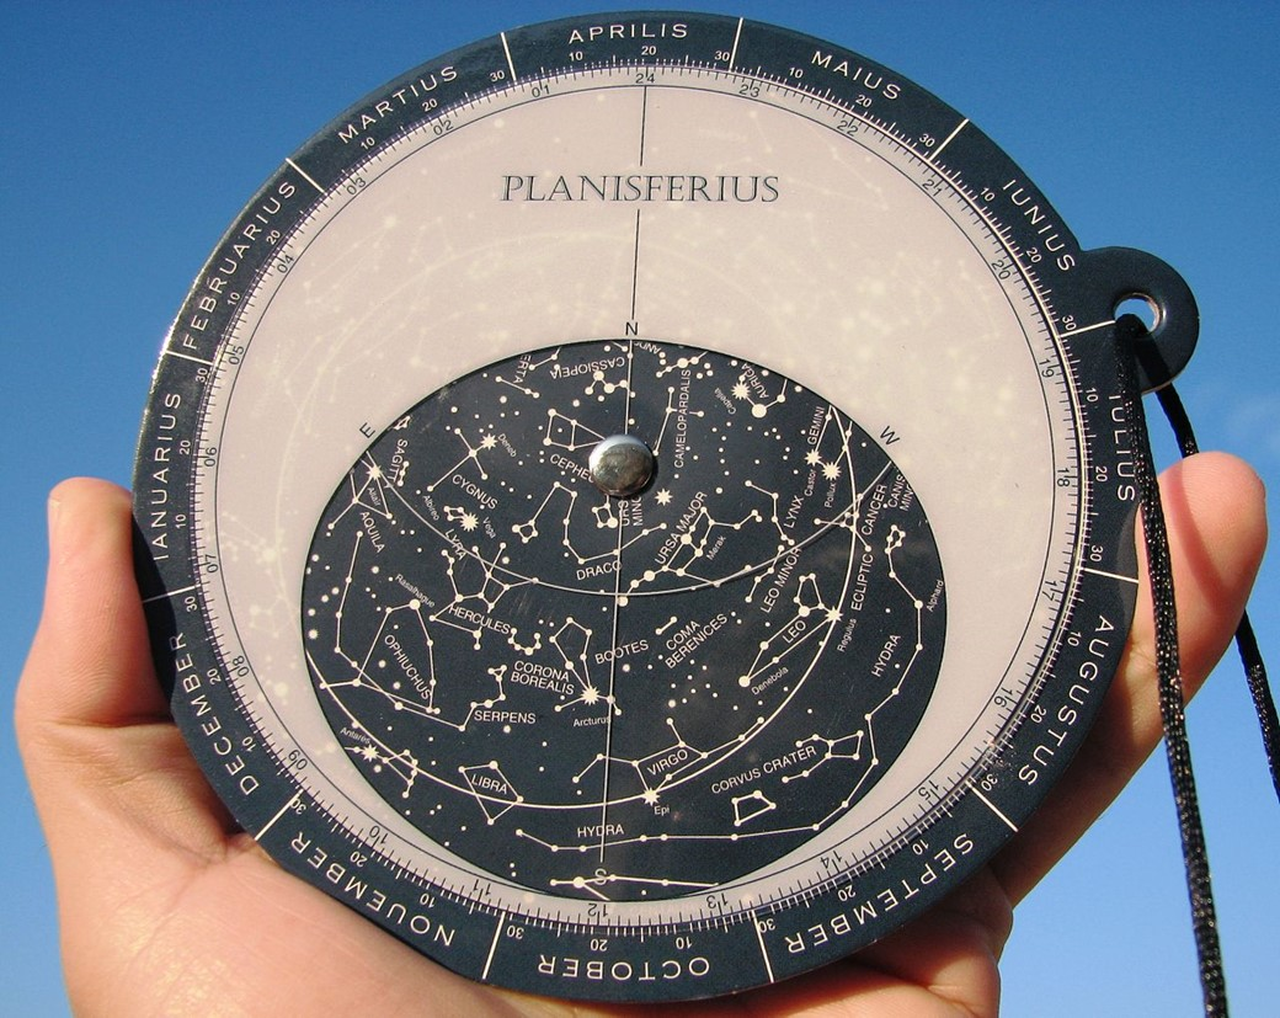 Planisfério celeste